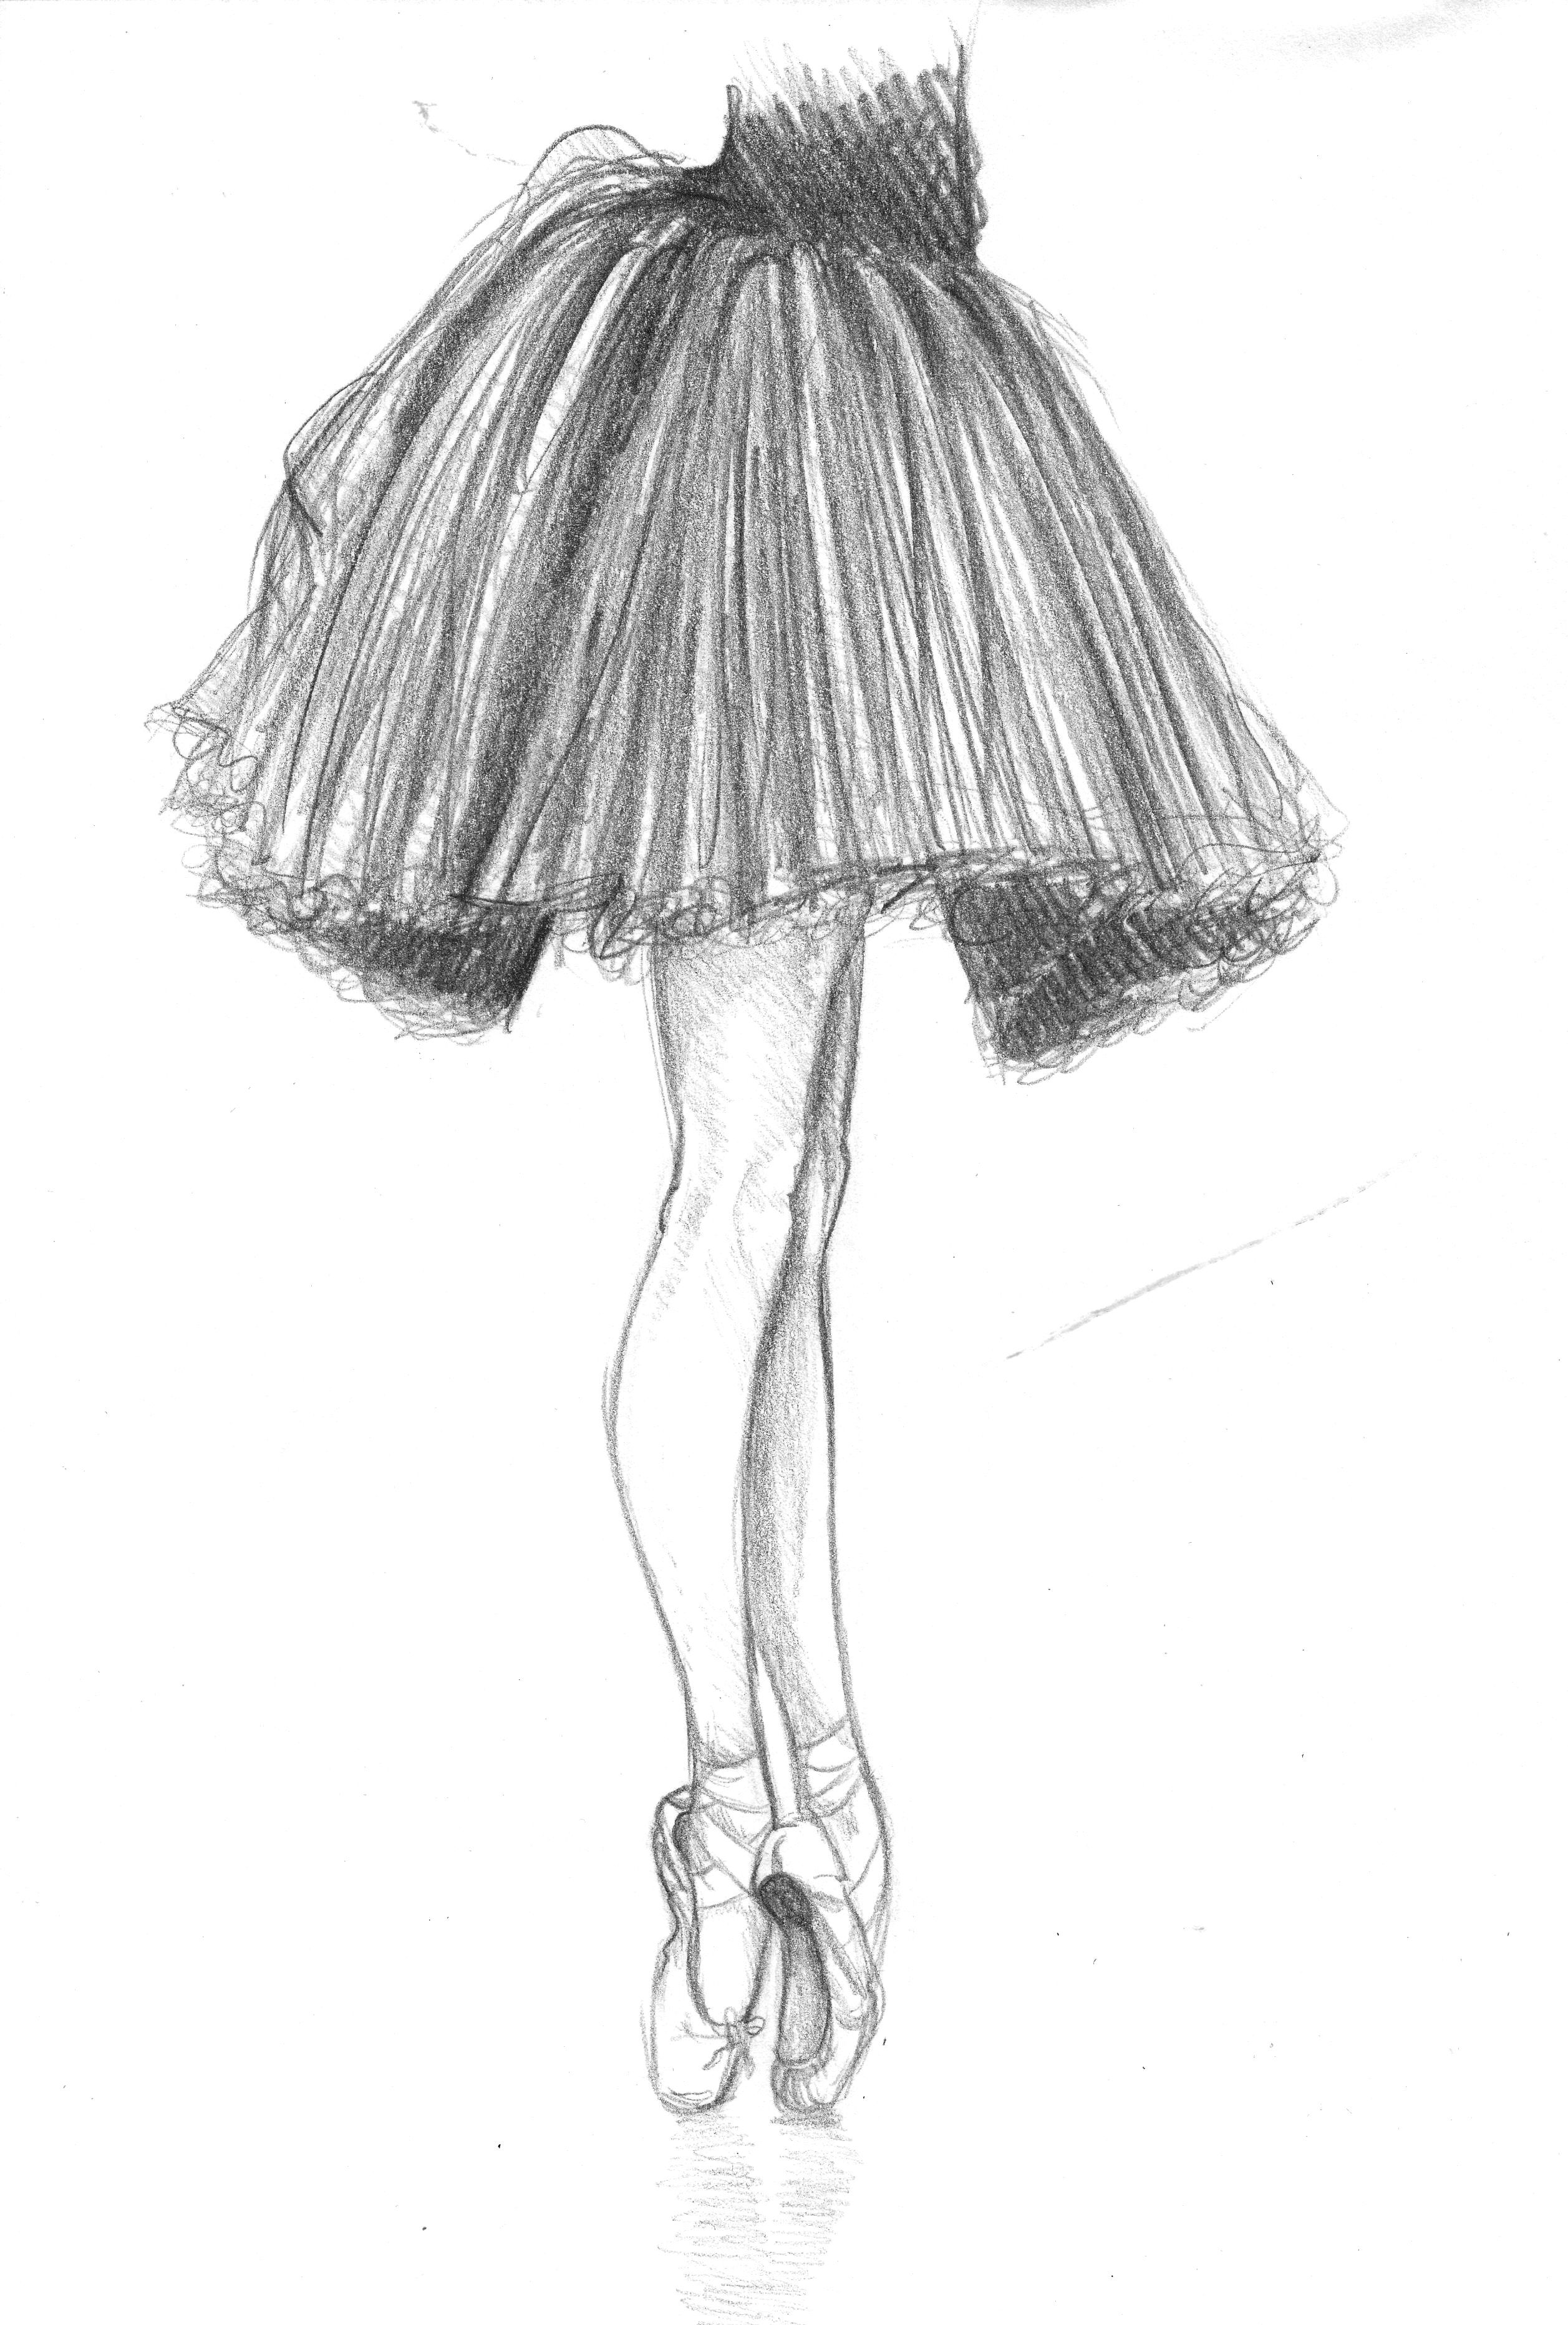 Uncategorized Drawing Of Ballerina ballerina dance pinterest drawings and image de ballet dancer sketch